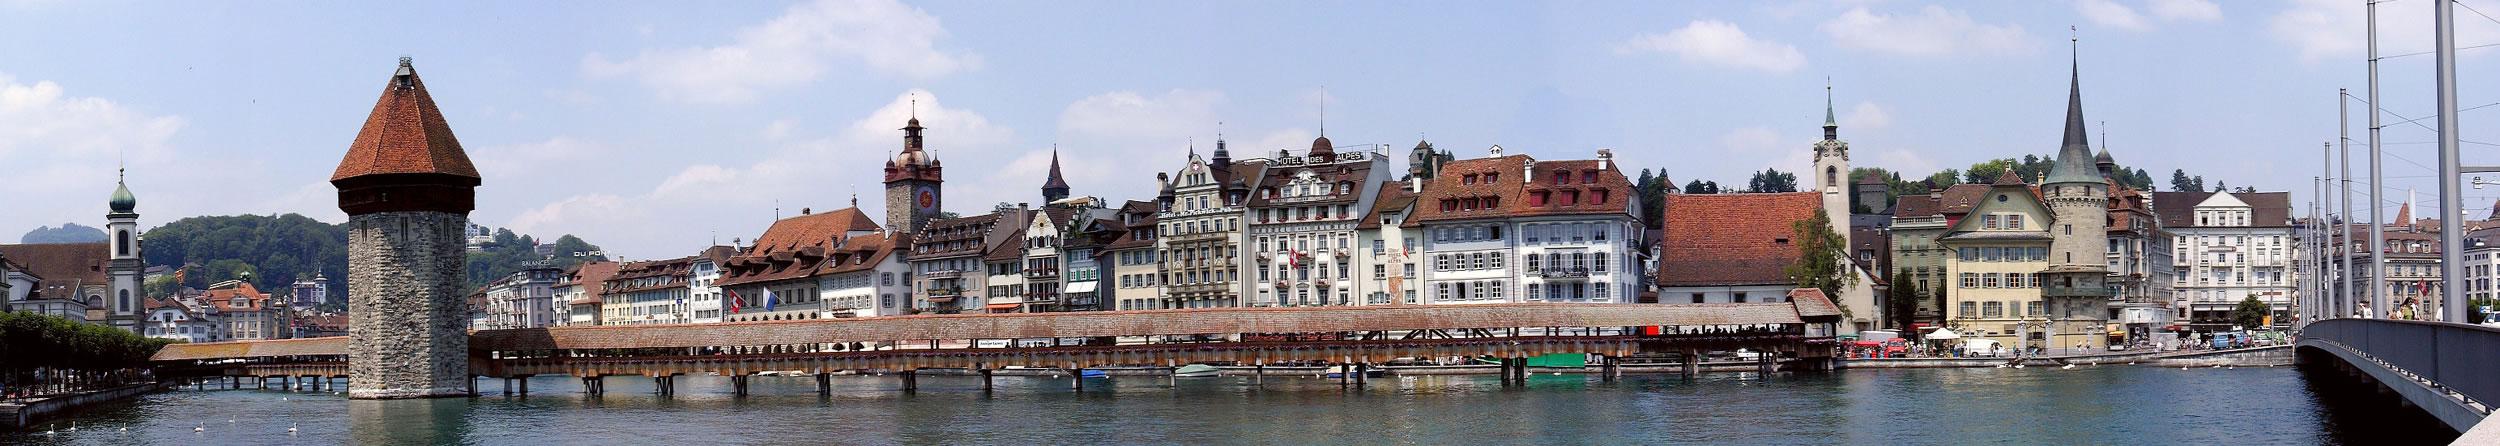 Lucerneguide 01 Lucerne Panorama Jpg